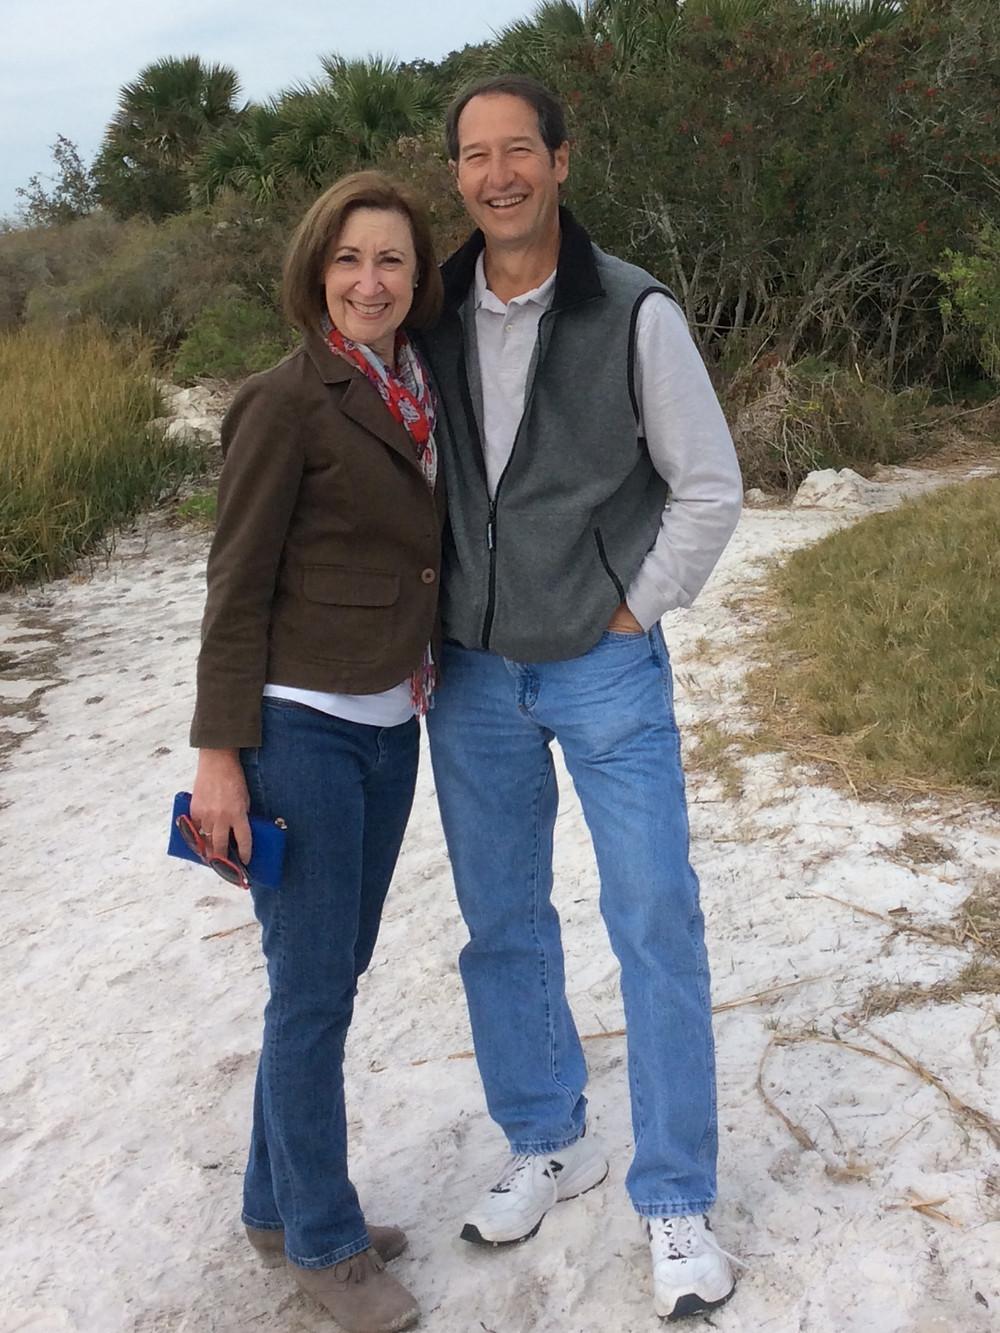 Meredith and Greg Kronz